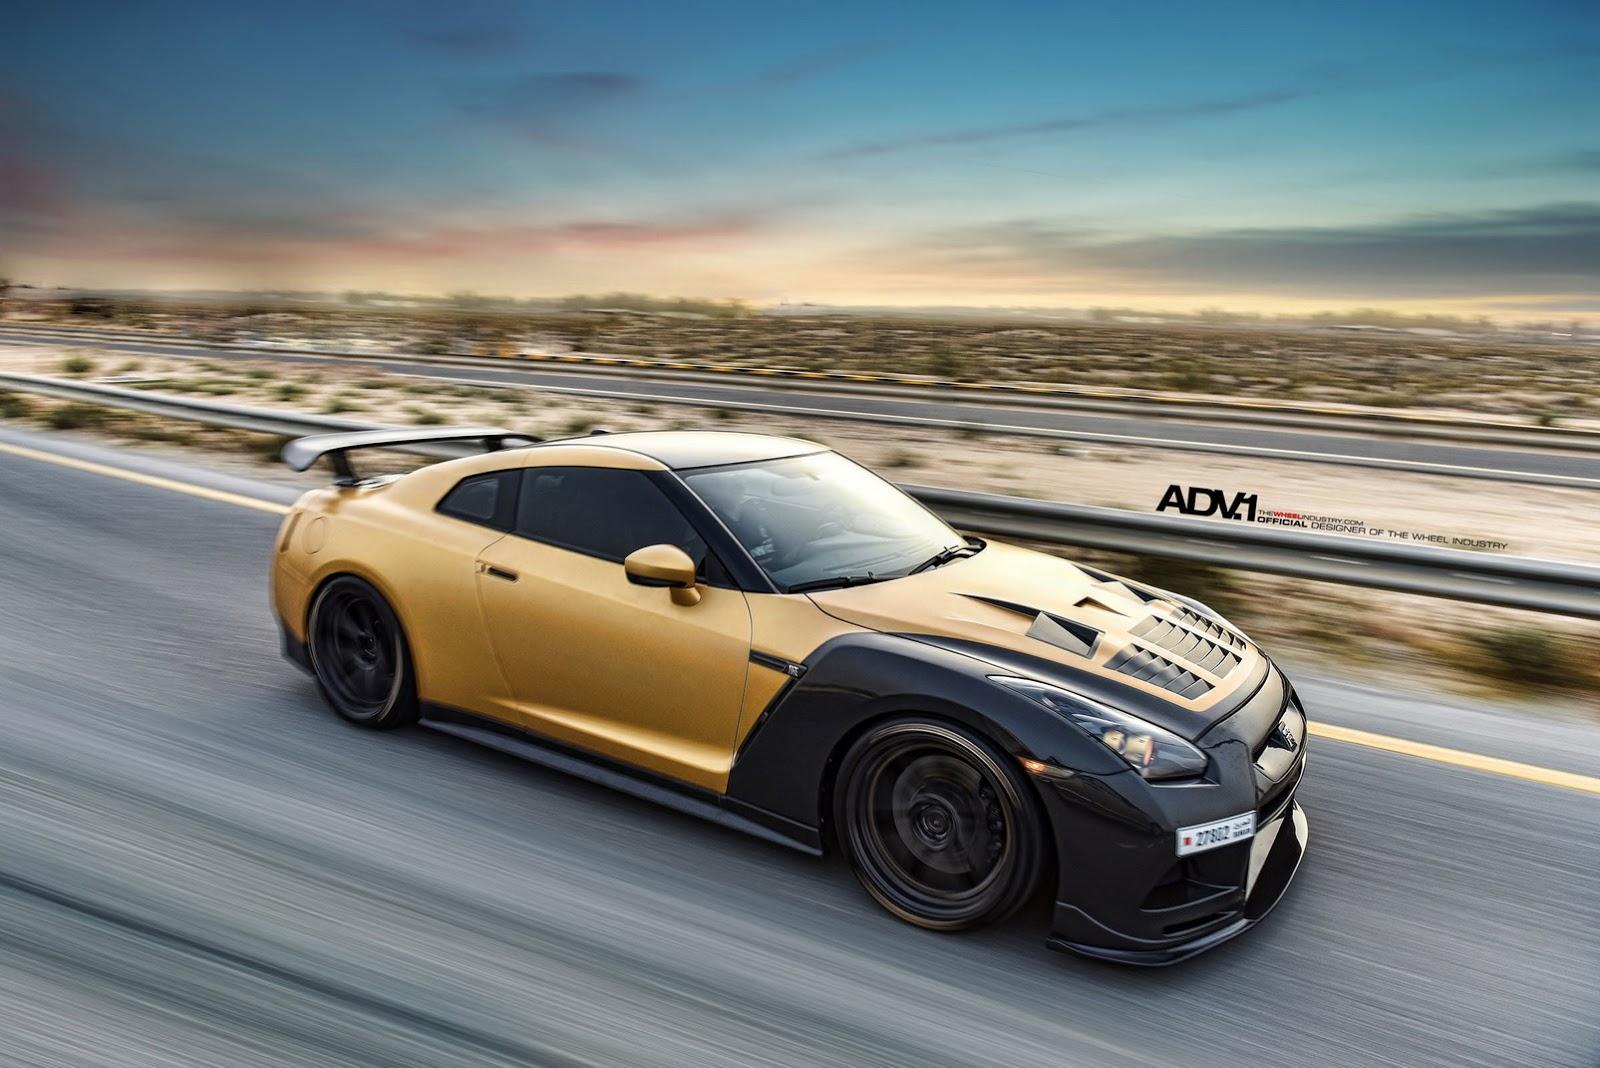 Nissan Tuning: Stunning ADV1 Carbon & Gold Nissan GT-R